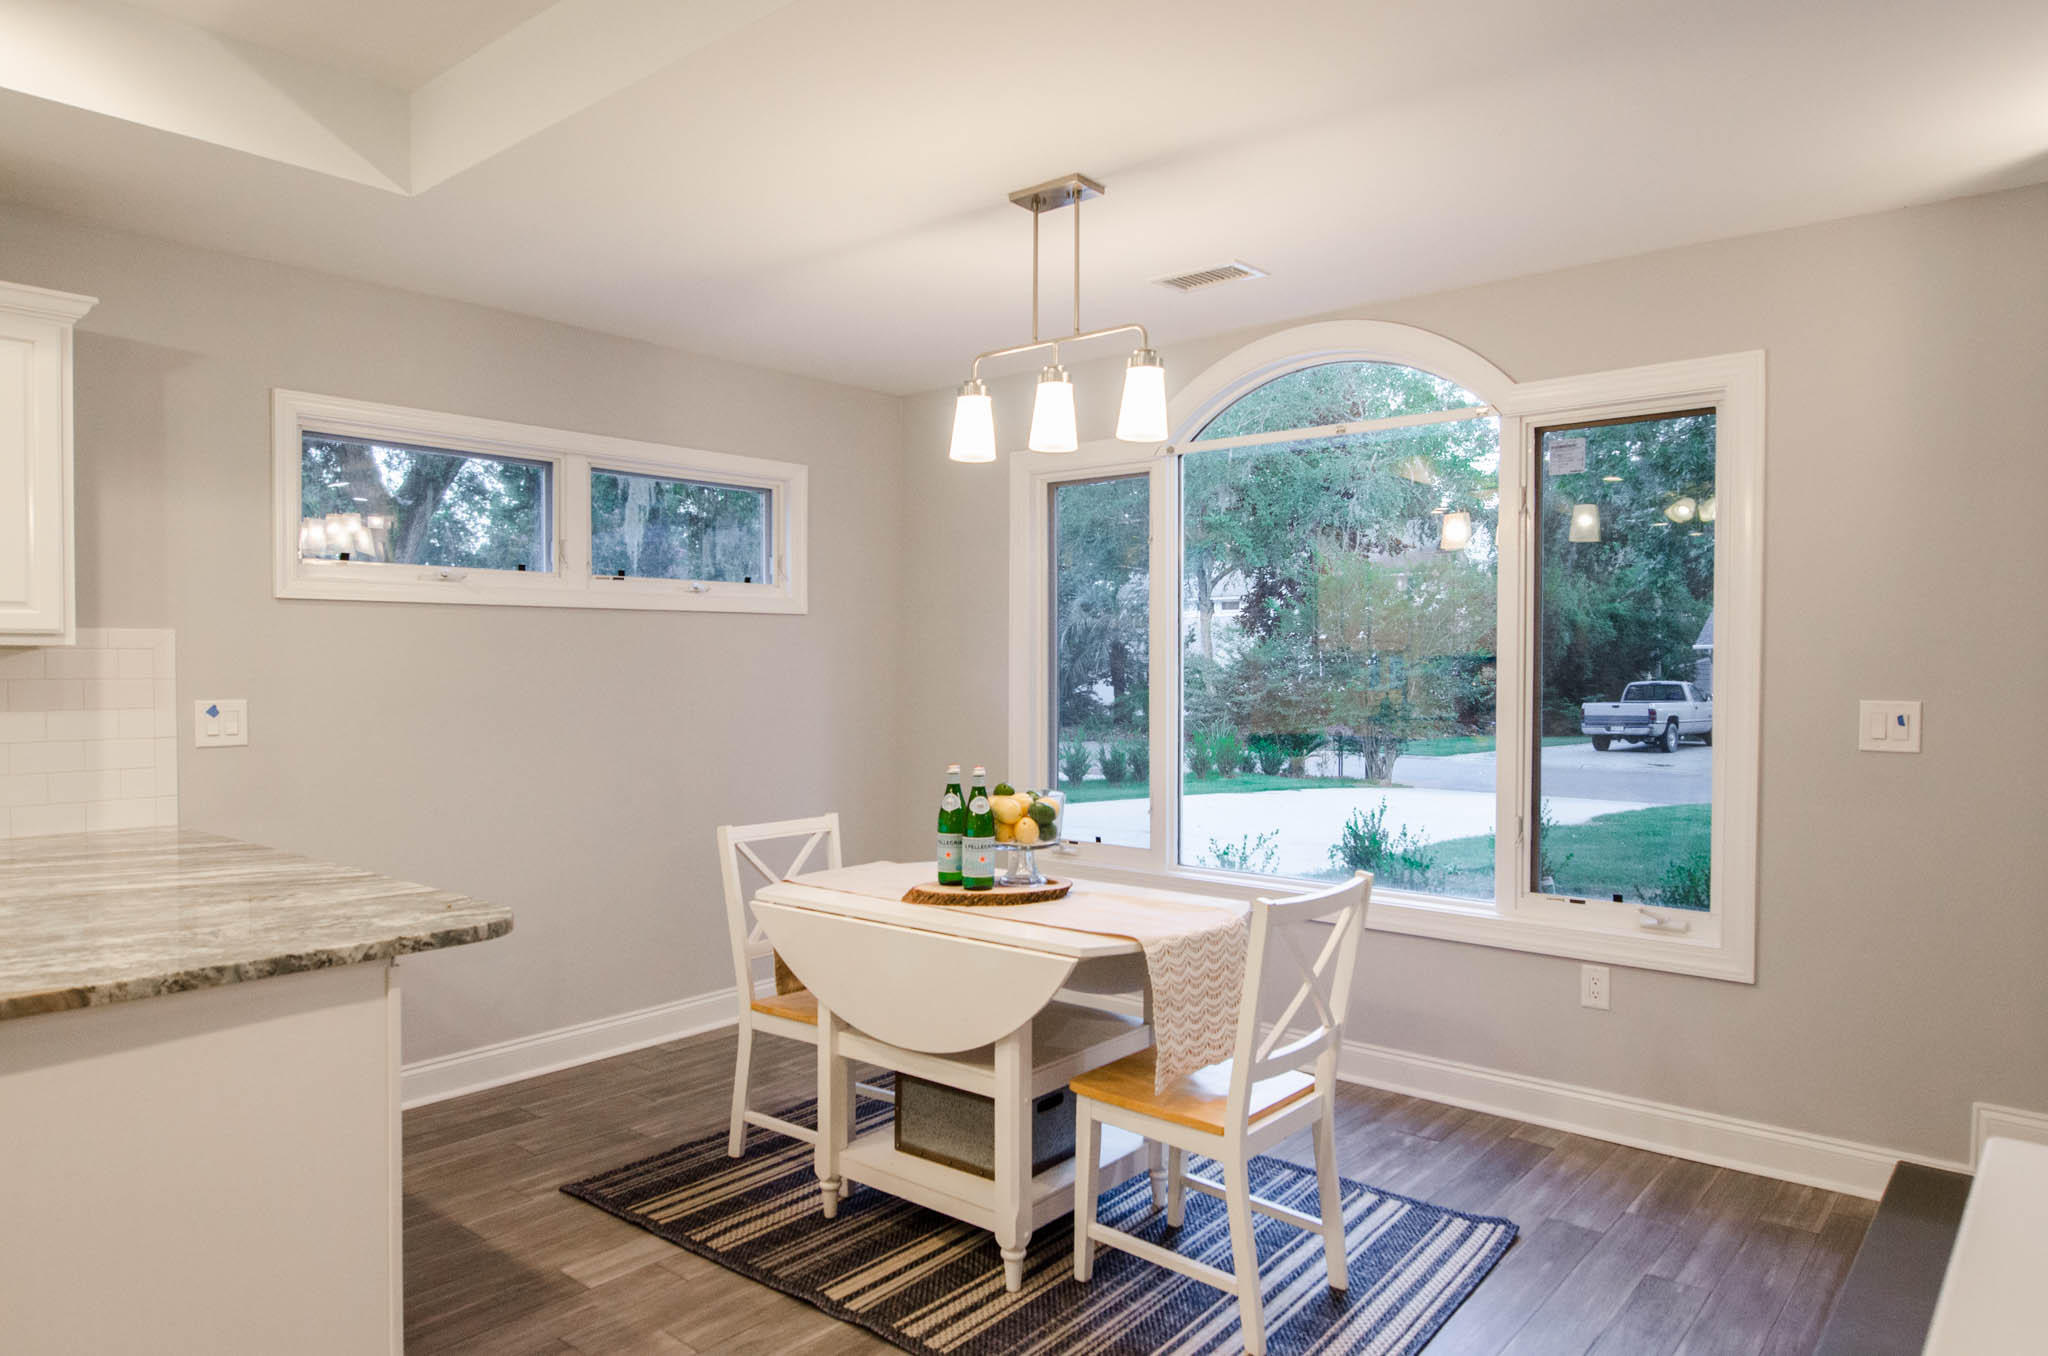 Covington Hills Homes For Sale - 5886 Ryans Bluff, North Charleston, SC - 11